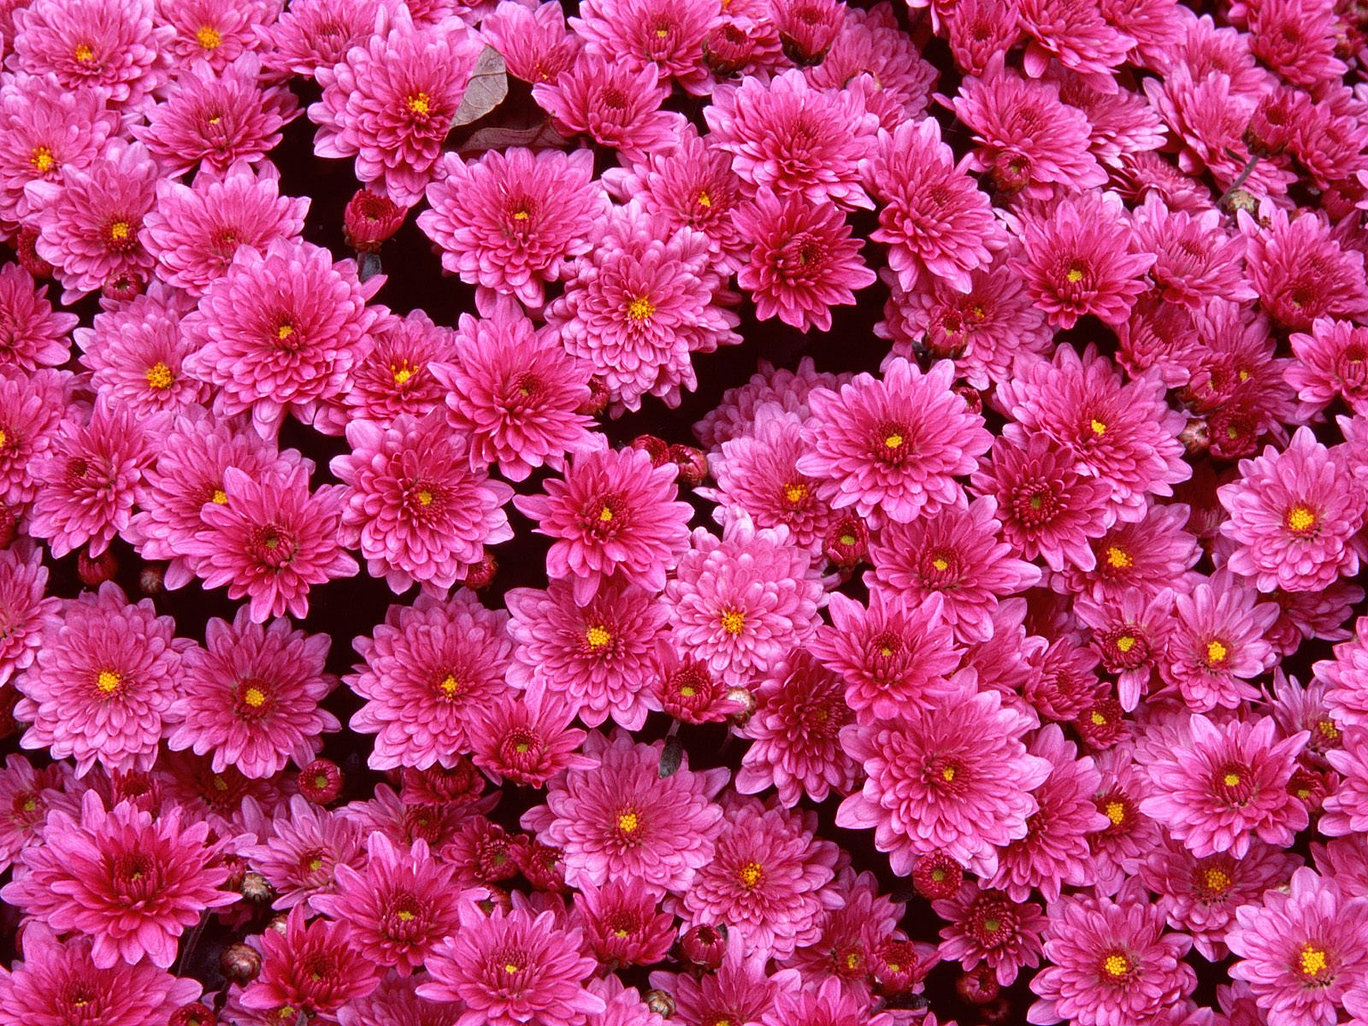 Donaflora floral design service wedding flowers silver spring md dark pink cushion mumsg mightylinksfo Choice Image